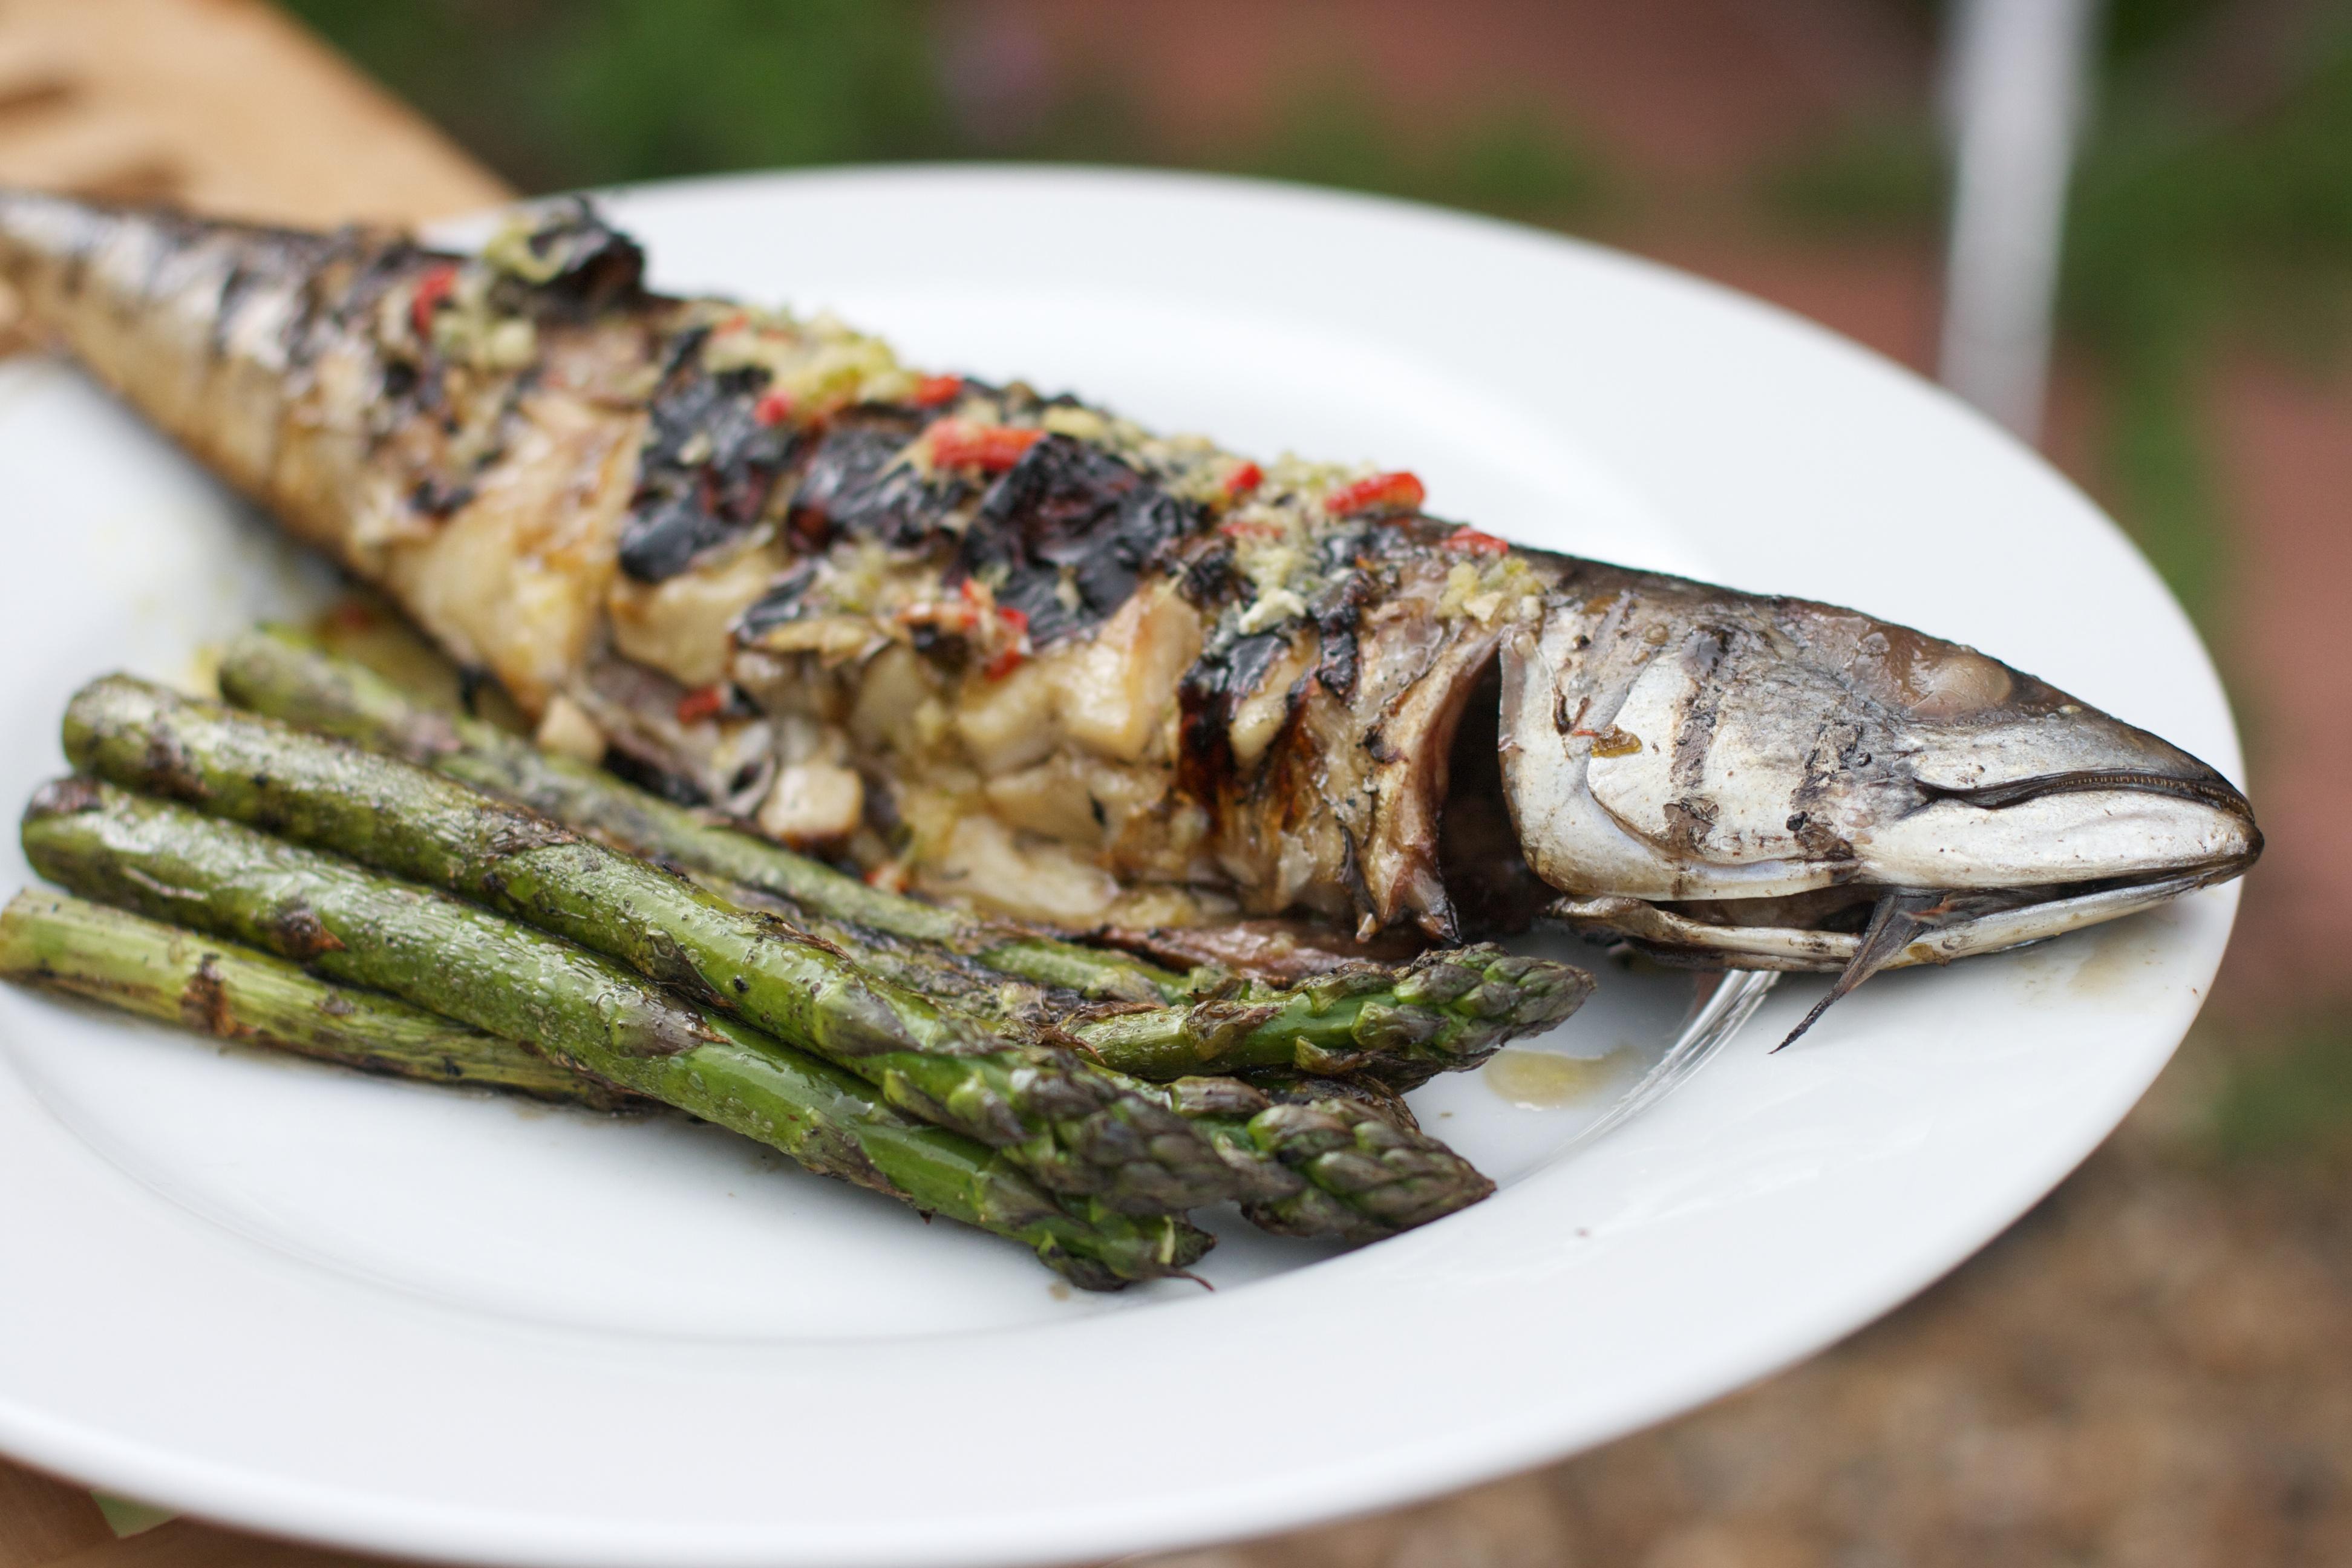 Mackerel on the grill